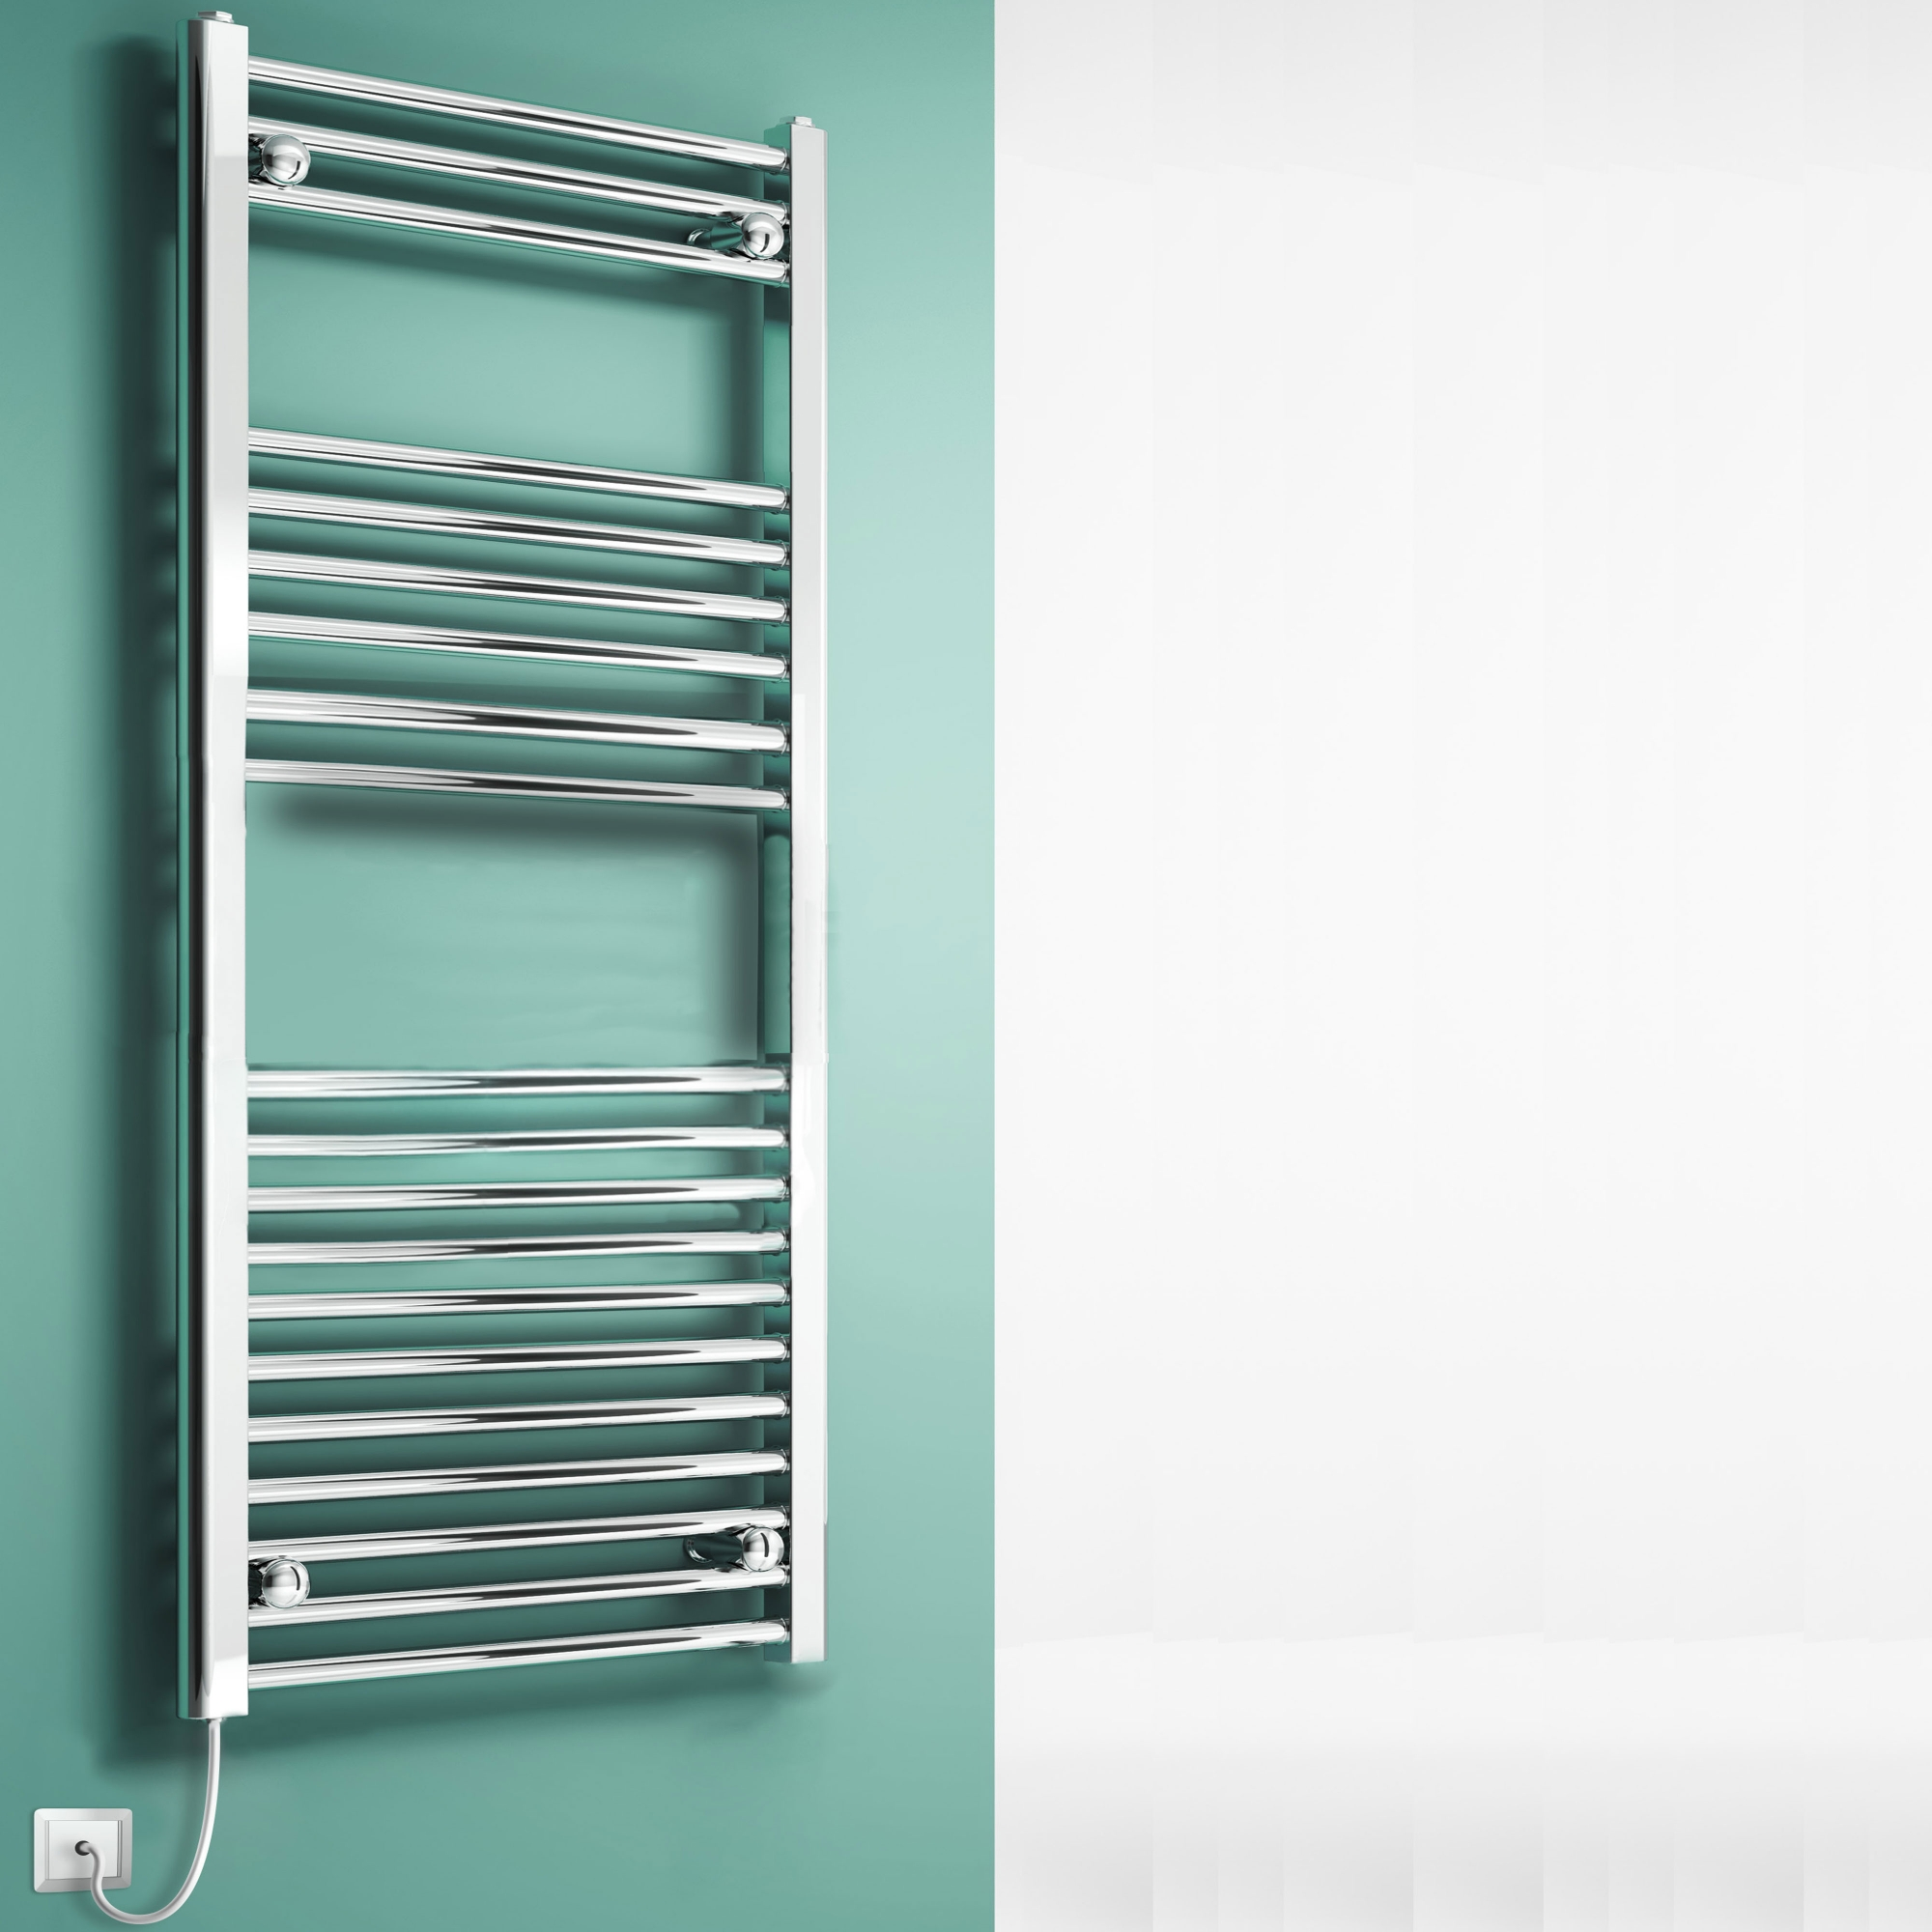 Reina Eross Dry Electric Heated Towel Rail 750mm H x 400mm W